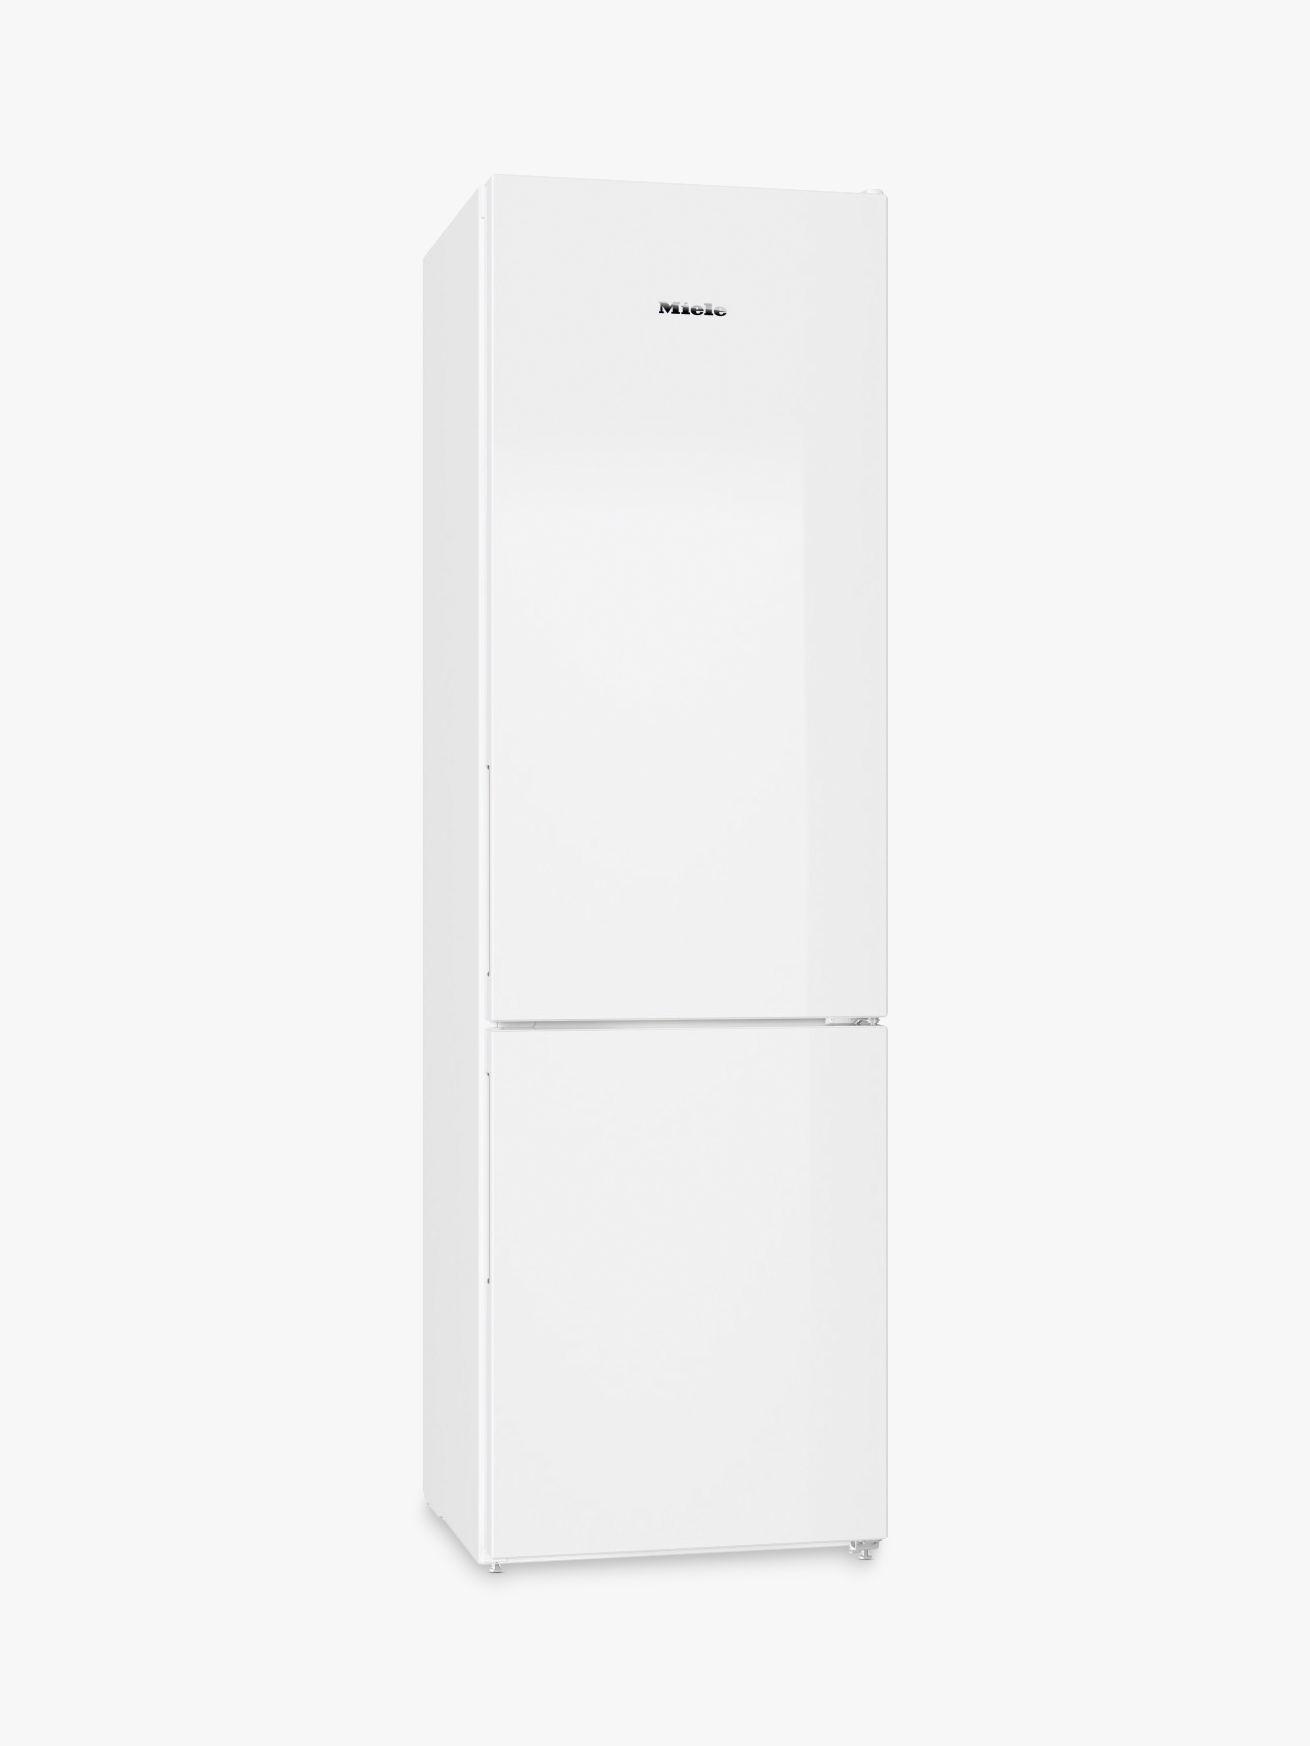 Miele Miele KFN29162D Freestanding Fridge Freezer, 60cm Wide, A++ Energy Rating